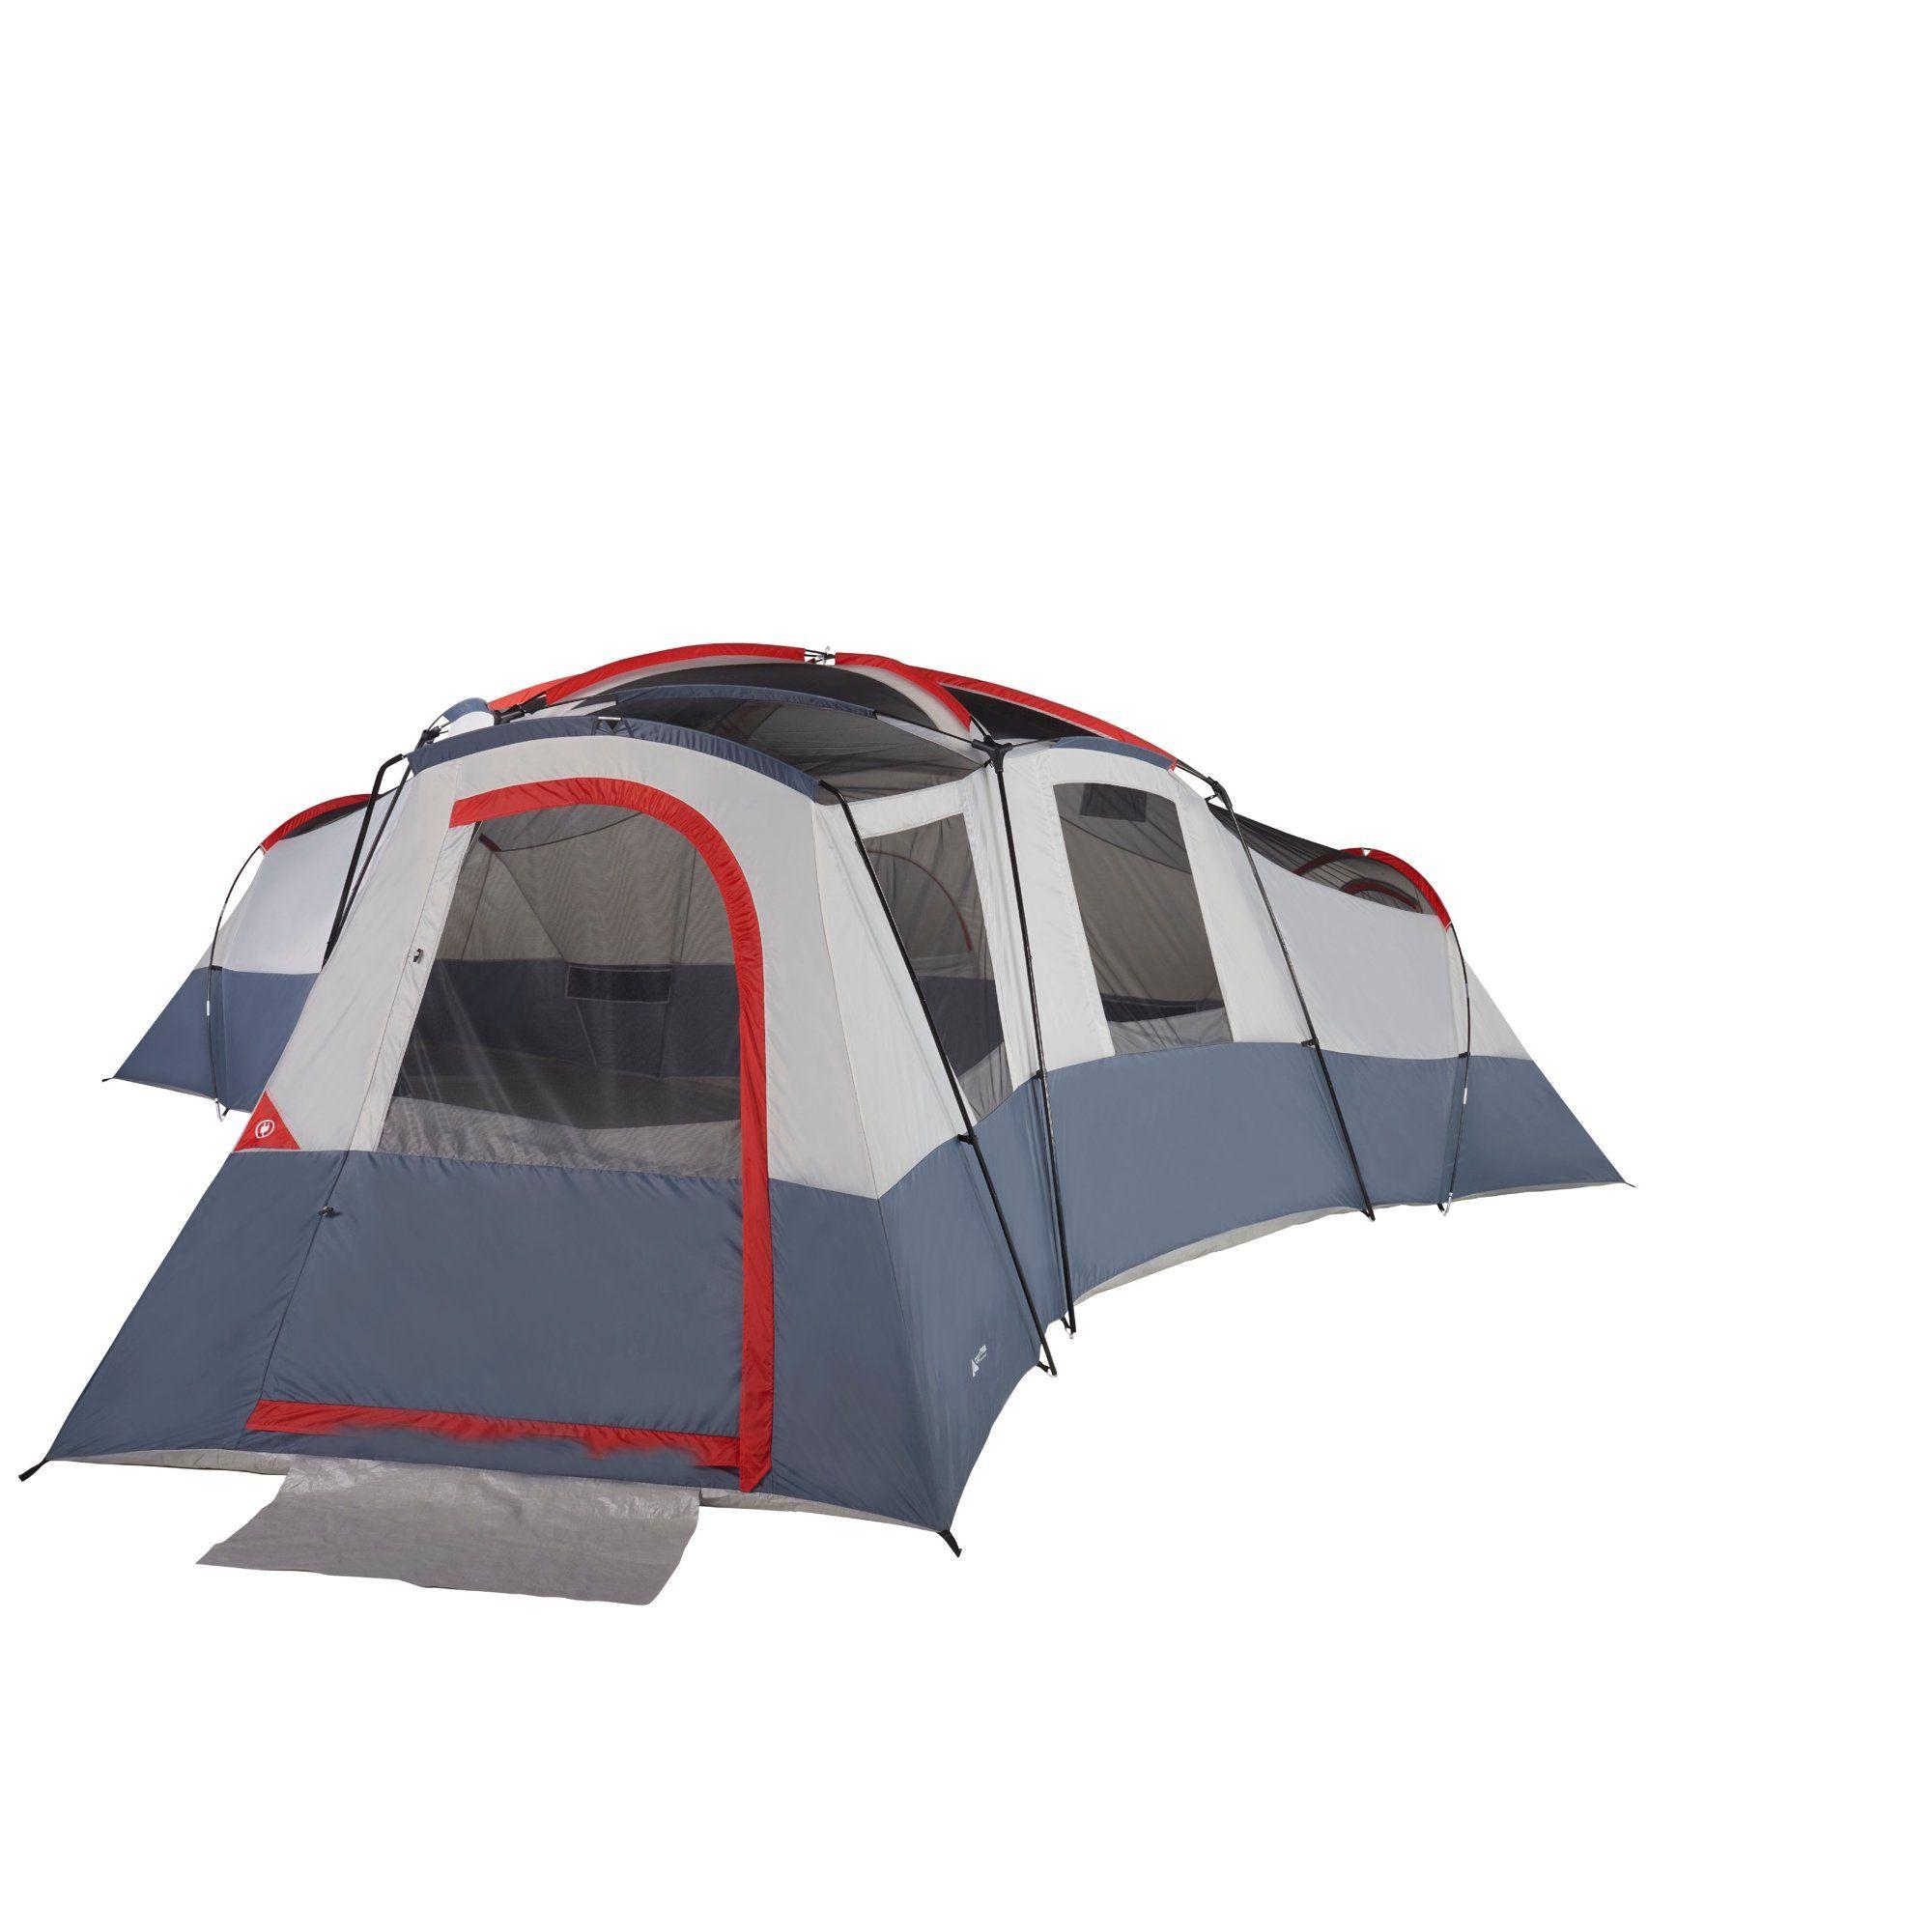 Ozark Trail 20 Person 4 Room Cabin Tent With 3 Separate Entrances Walmart Com Cabin Tent Tent Ozark